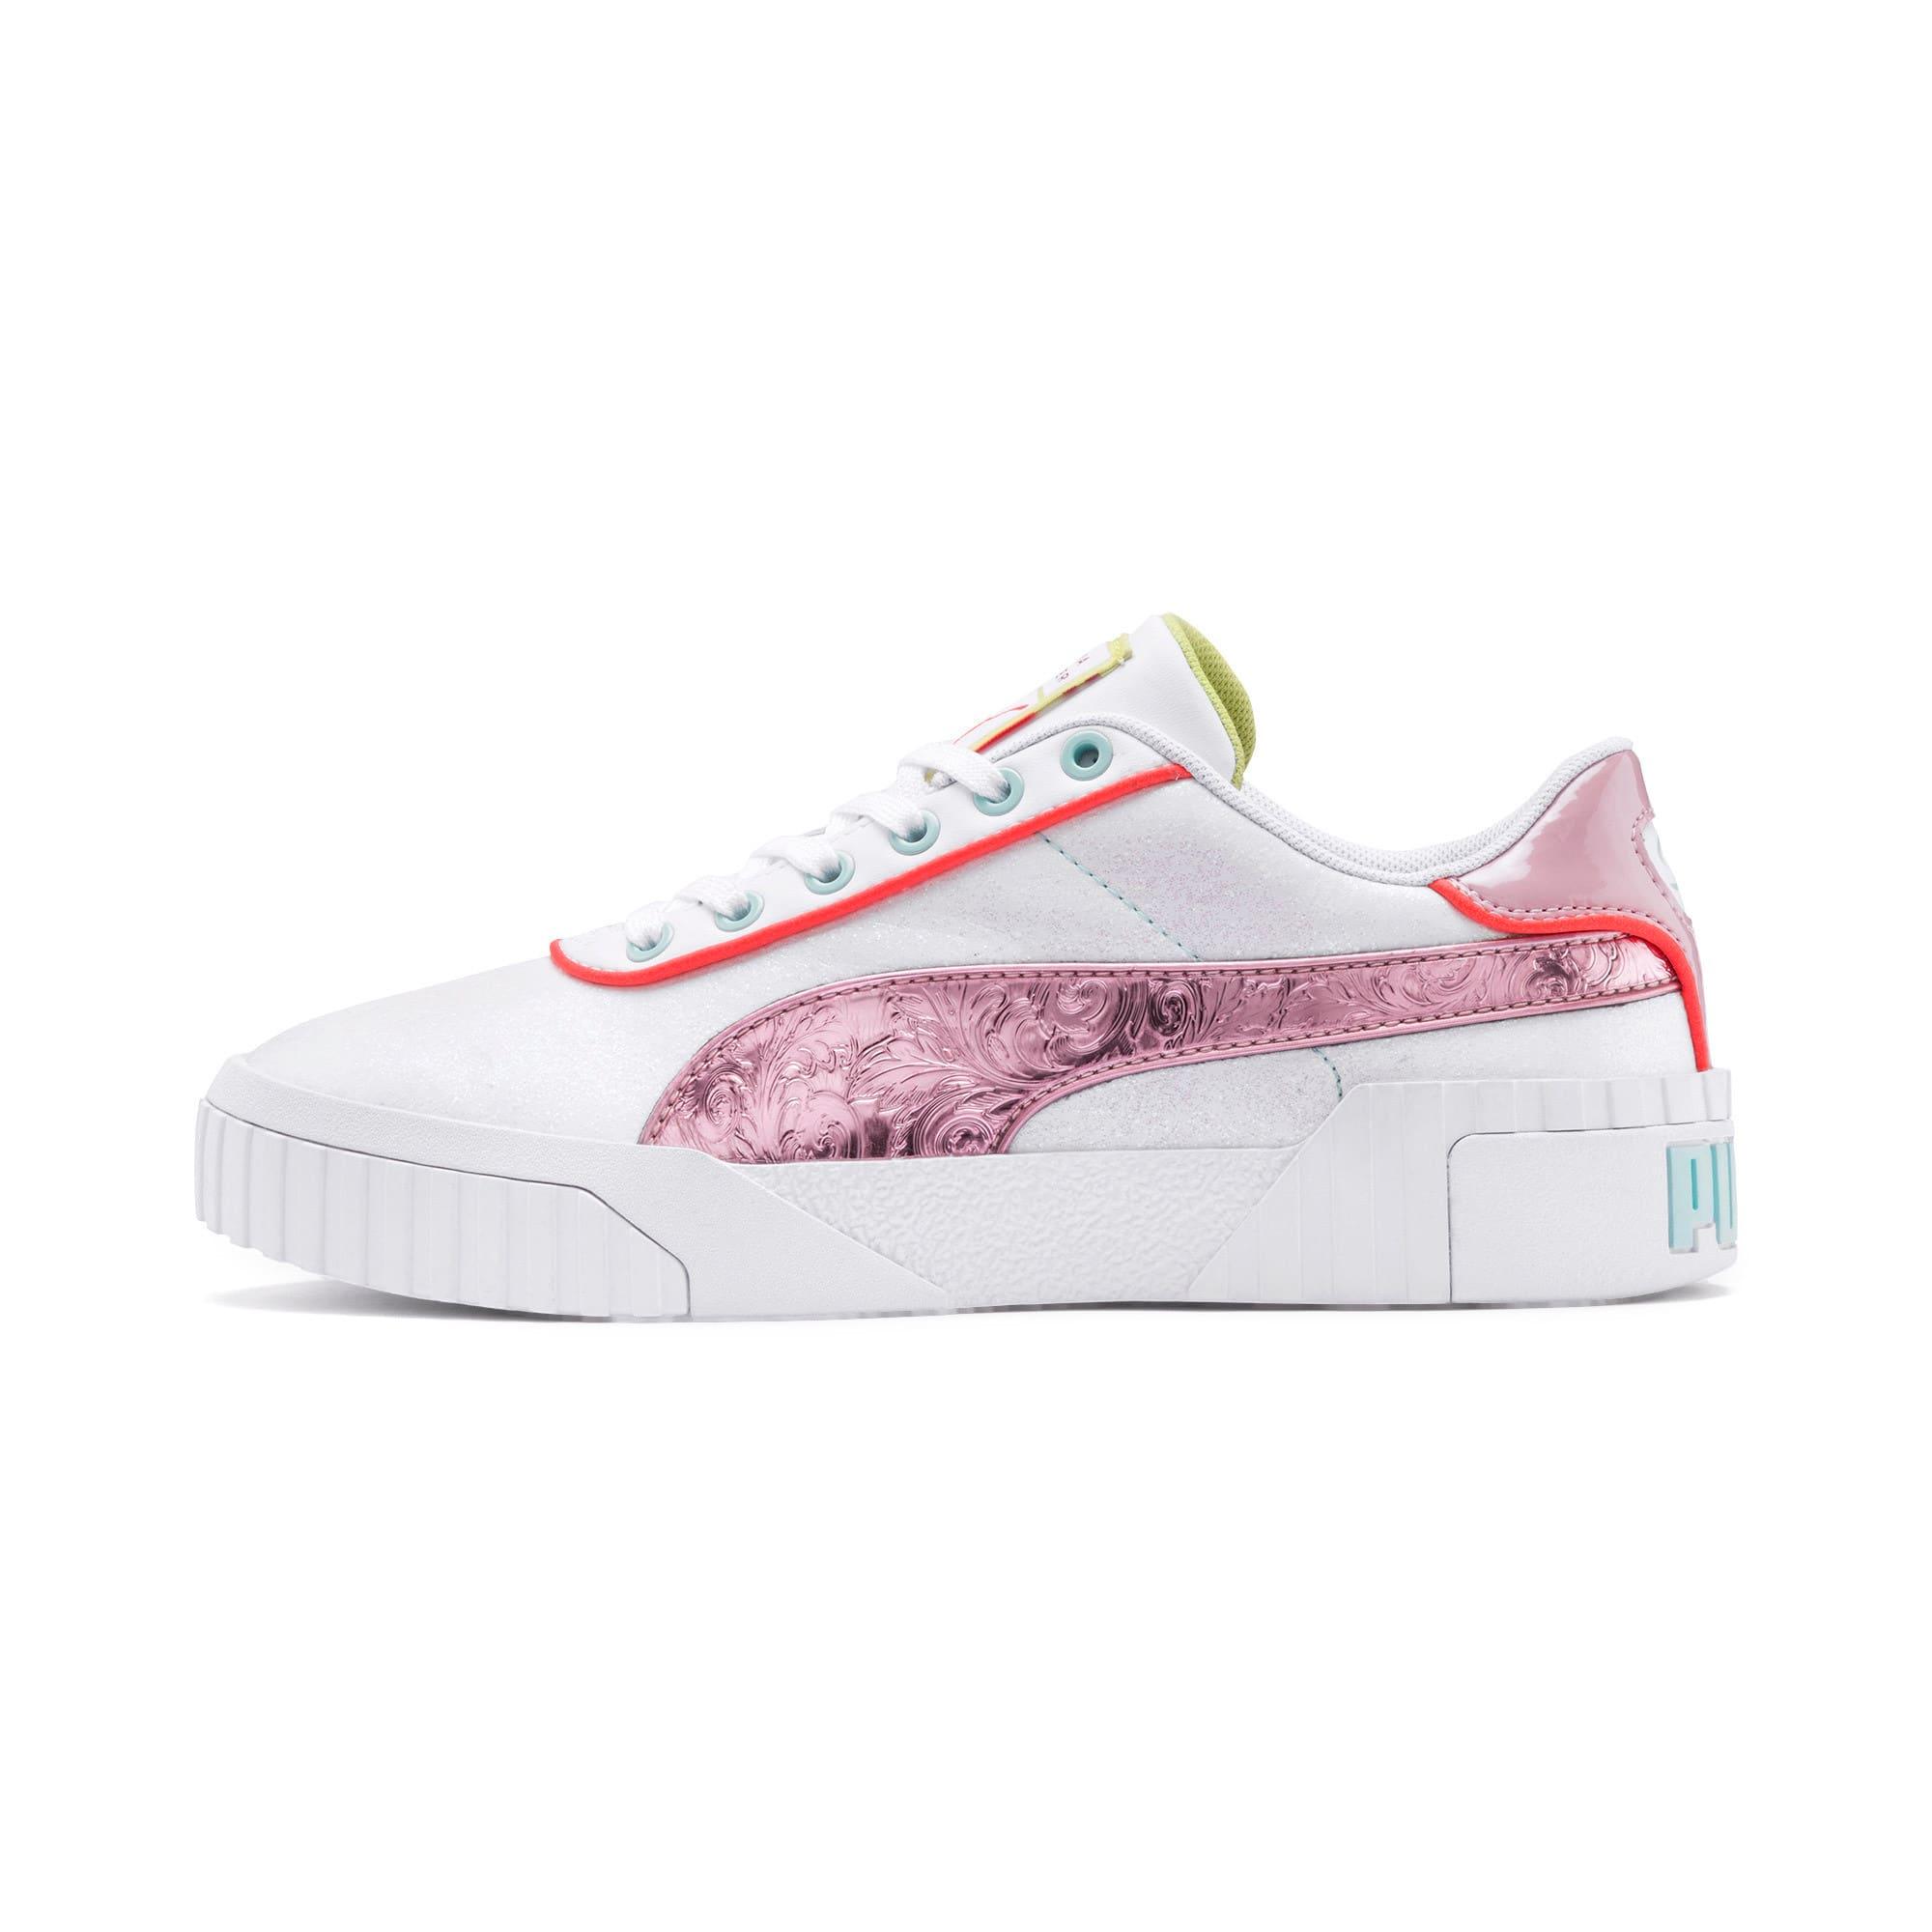 Thumbnail 1 of PUMA x SOPHIA WEBSTER Cali Women's Sneakers, Puma White-Pale Pink, medium